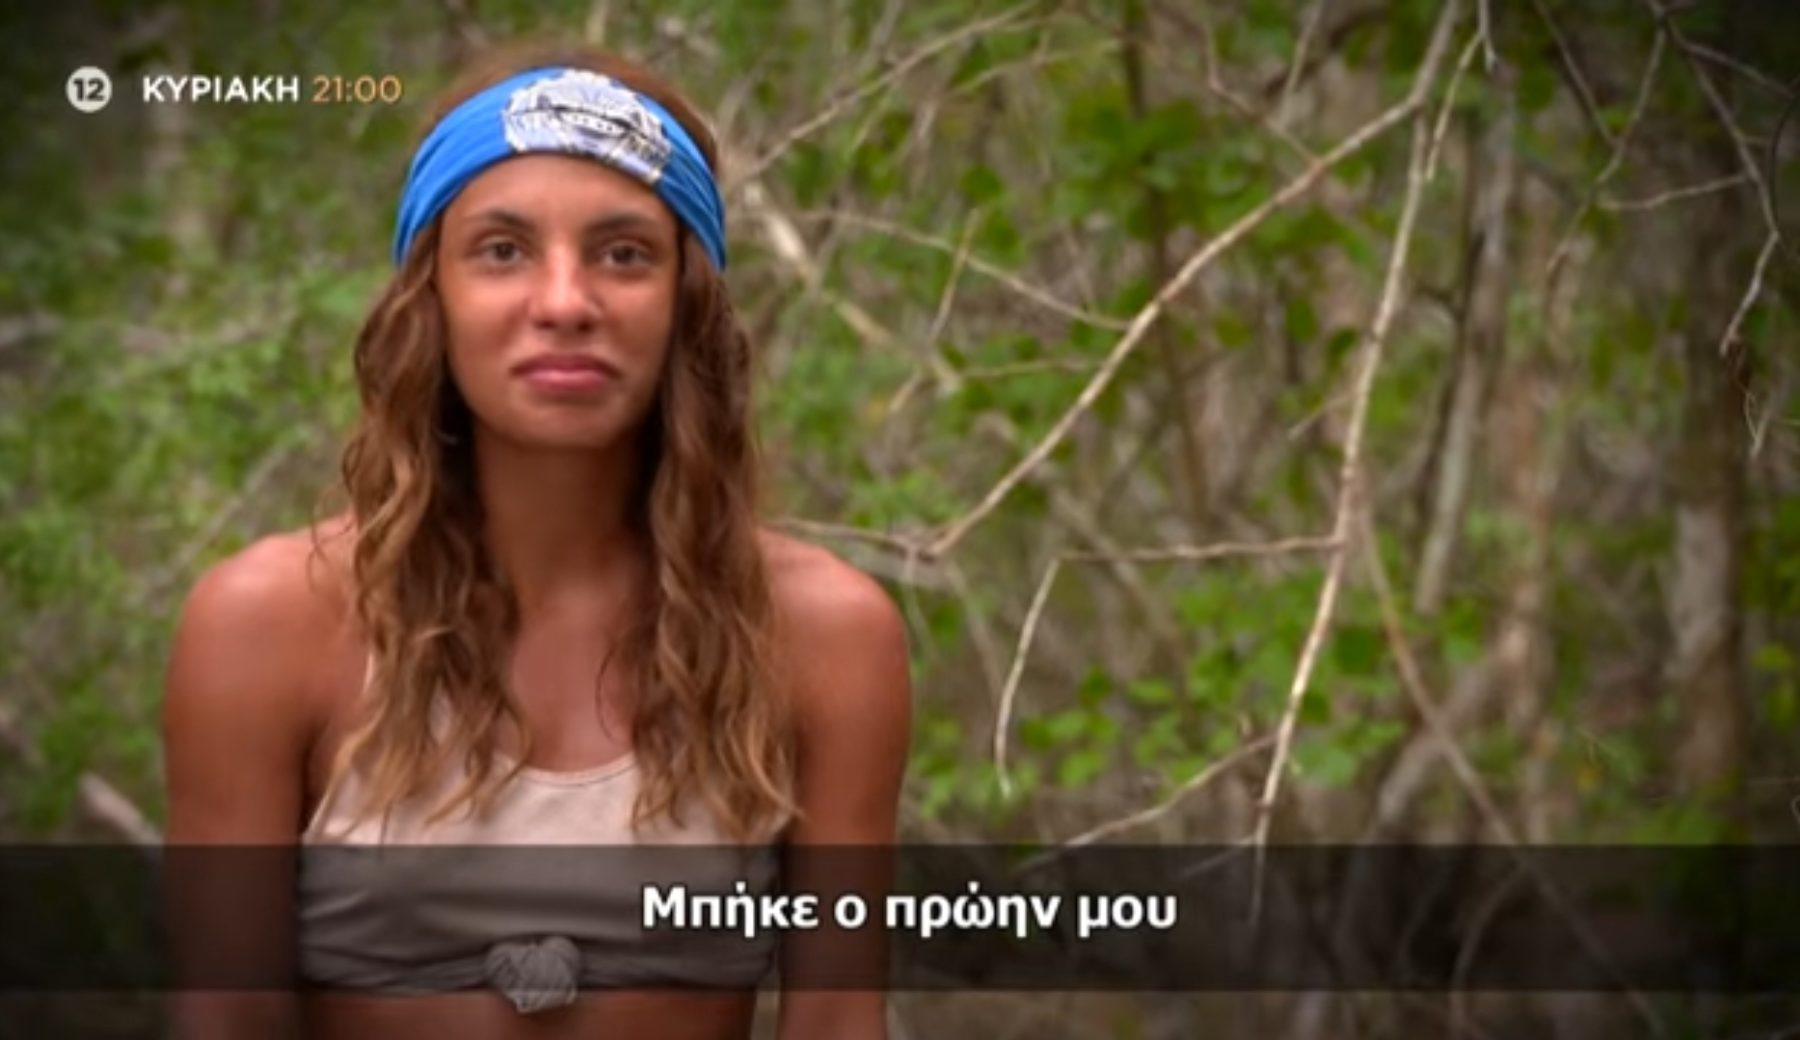 Survivor spoiler: Εμπόλεμη ζώνη θυμίζει ο Άγιος Δομίνικος! Η Μαριαλένα απείλησε να αποχωρήσει μετά τις ειρωνείες του πρώην συντρόφου της